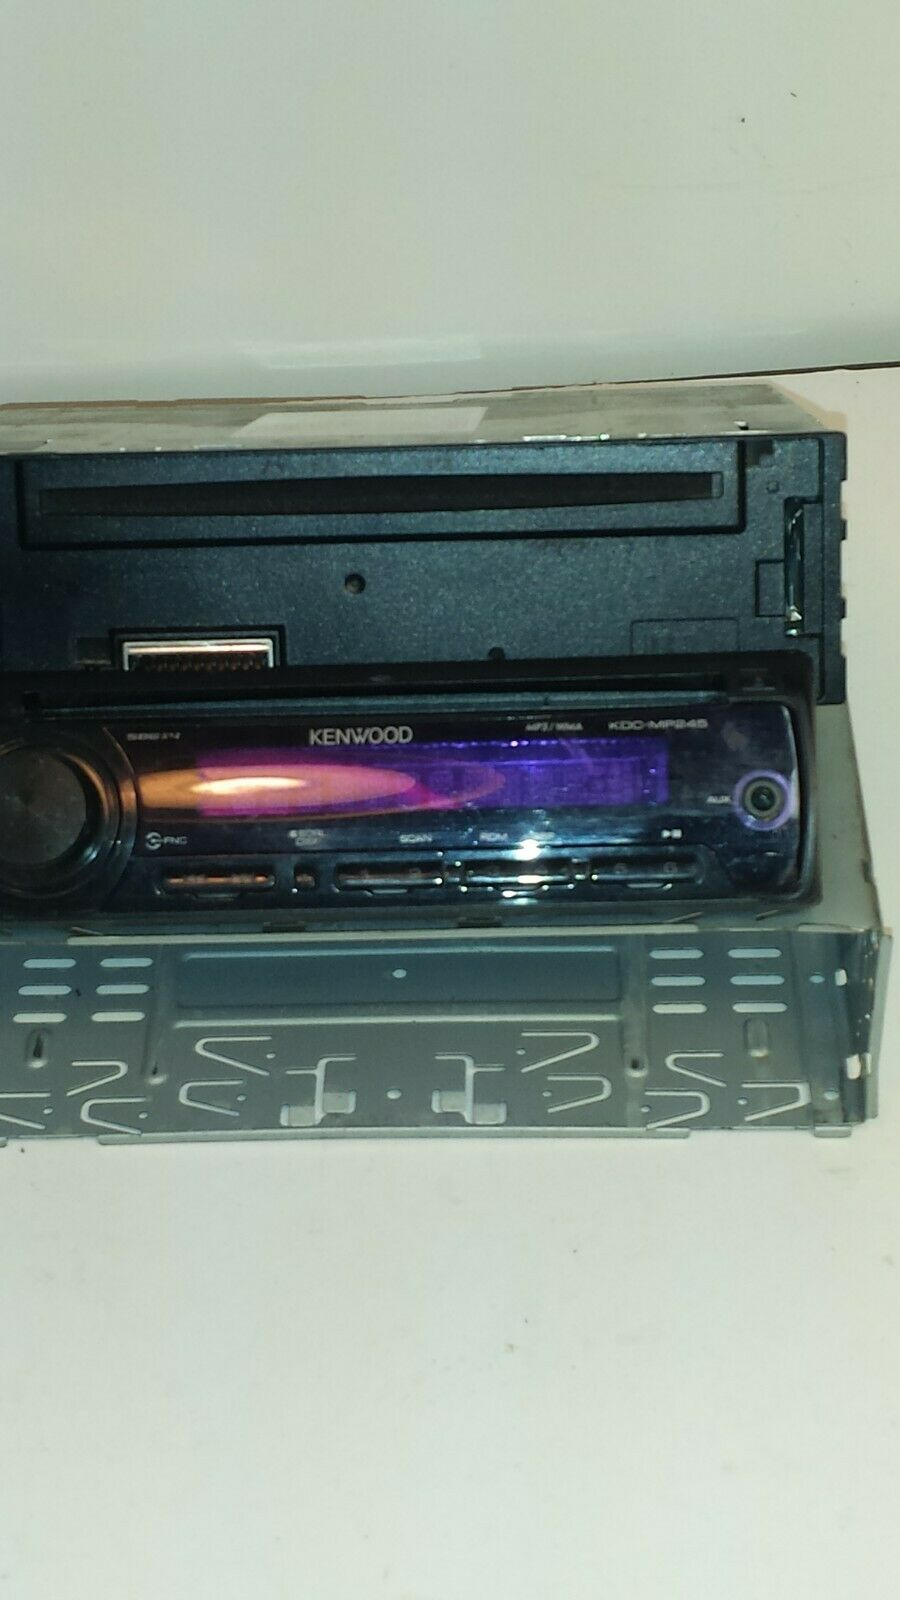 Amazon.com: Brand New Kenwood Excelon KDC-X395 In-Dash CD